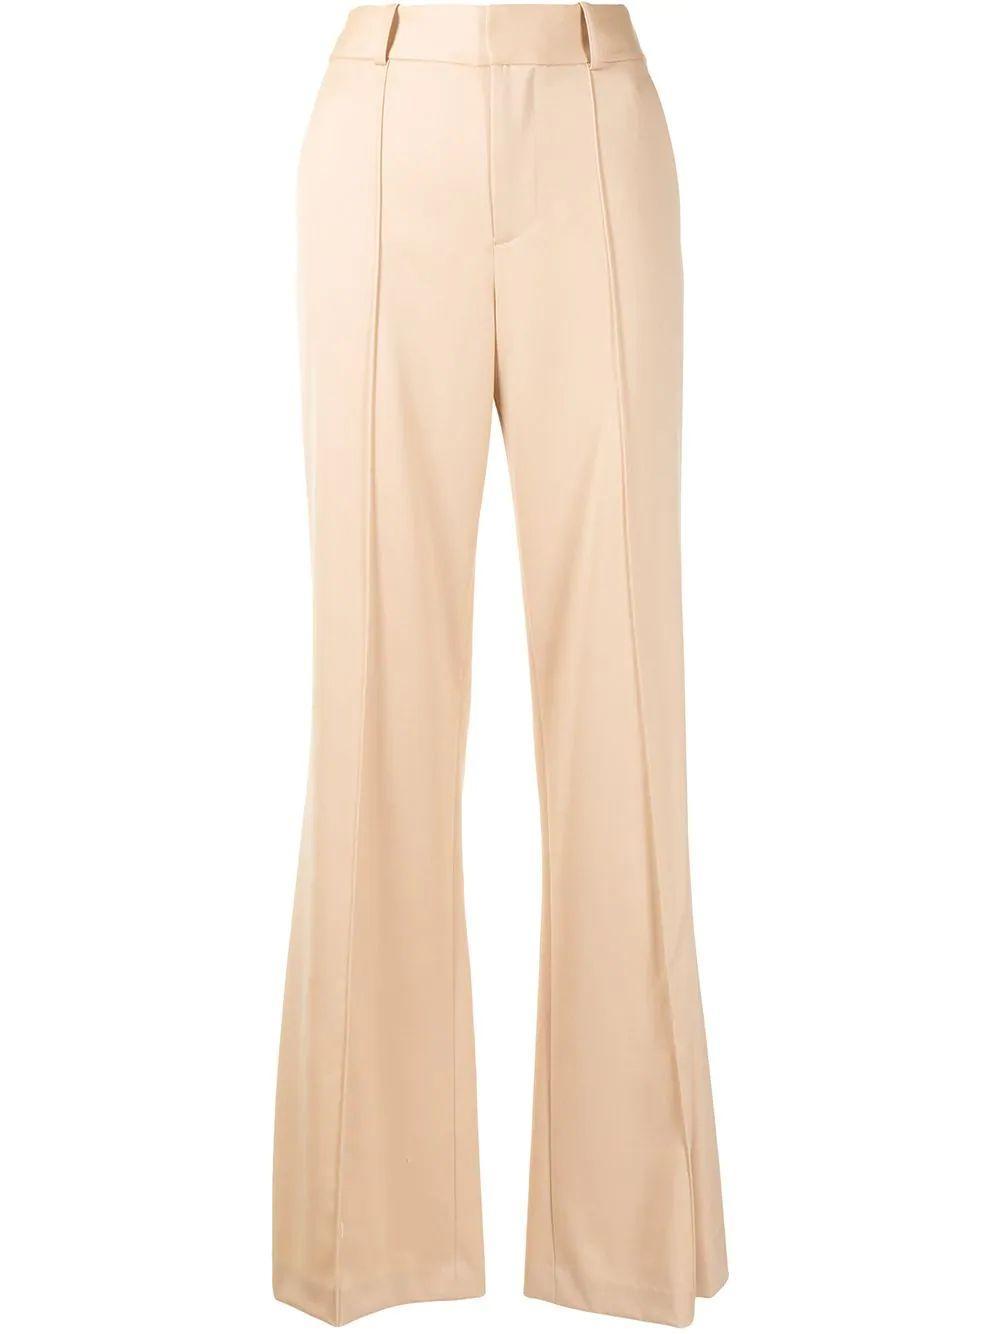 Paula High Waisted Trousers Item # CL000214101